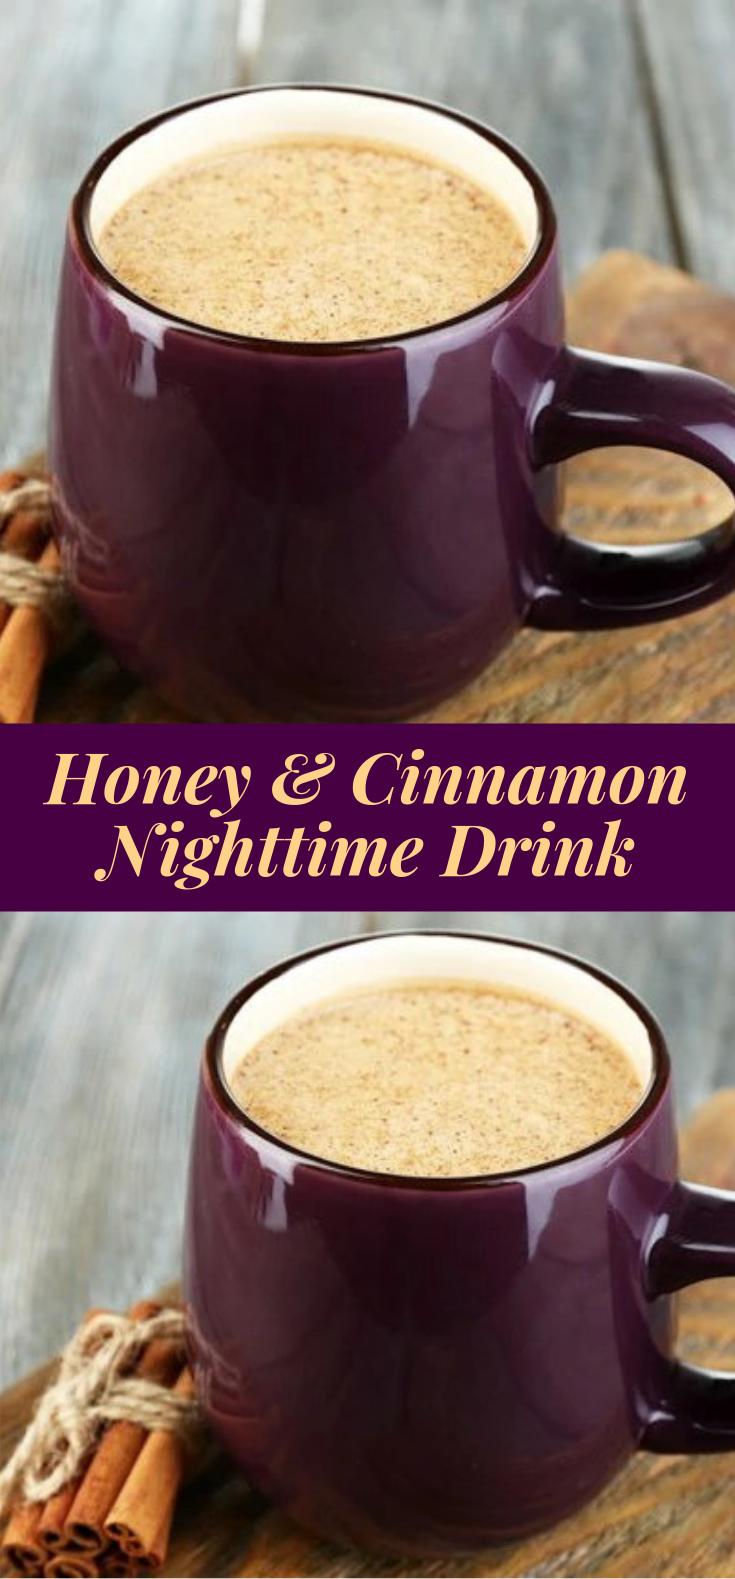 Honey and Cinnamon Nighttime Drink #hotdrink #cinnamon